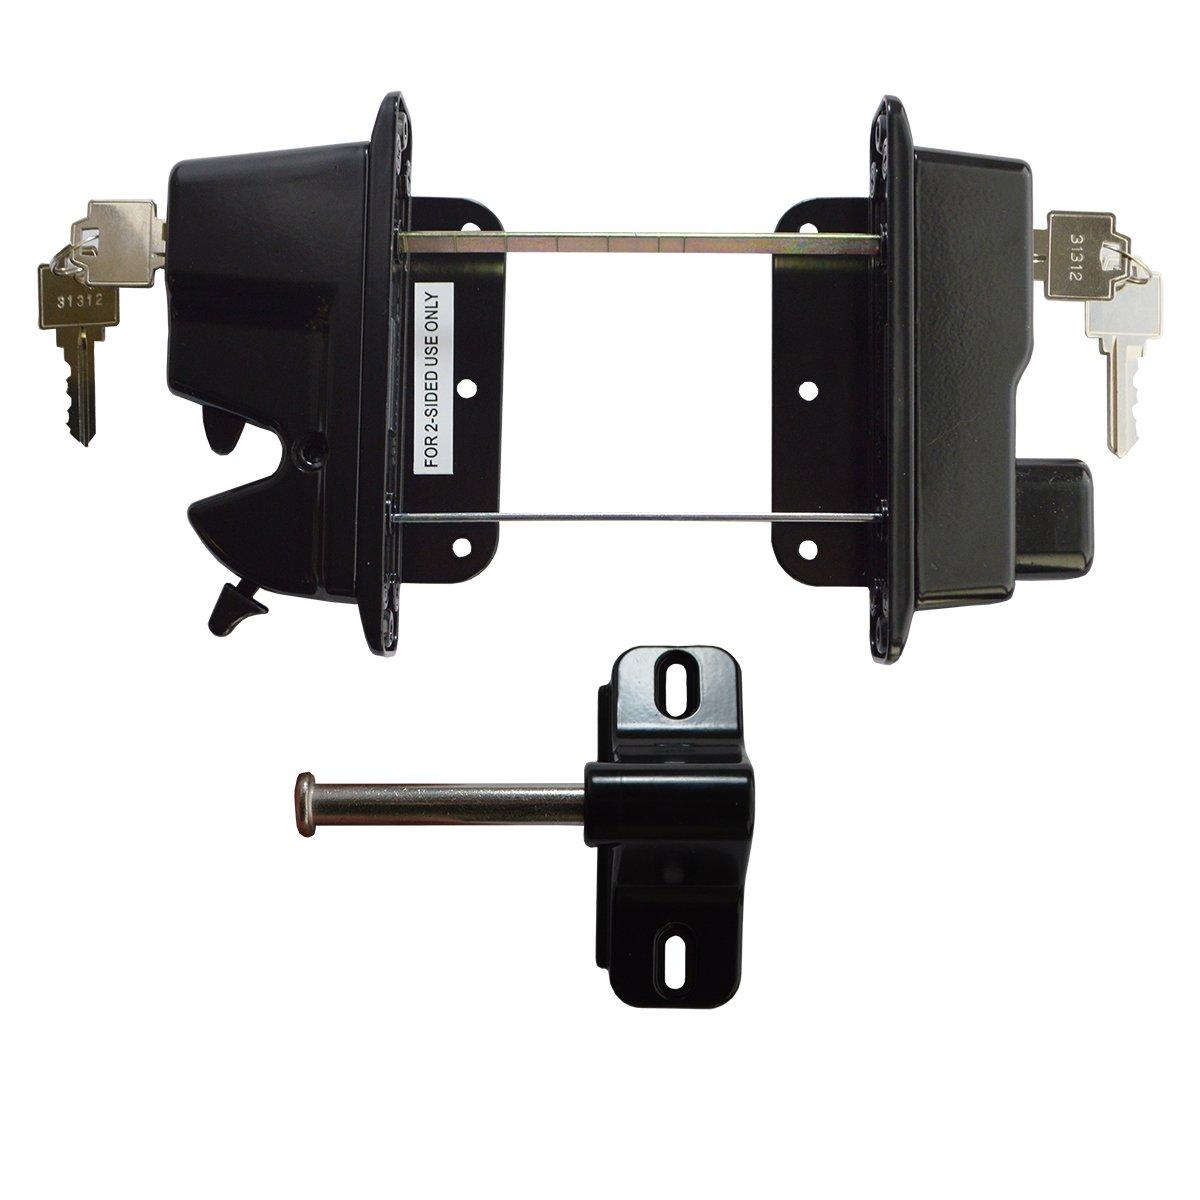 Keystone Black Zinc Diecast Metal Key Lockable Latch   2-Sided   Keyed Alike   KLADV-M2-BK-KA